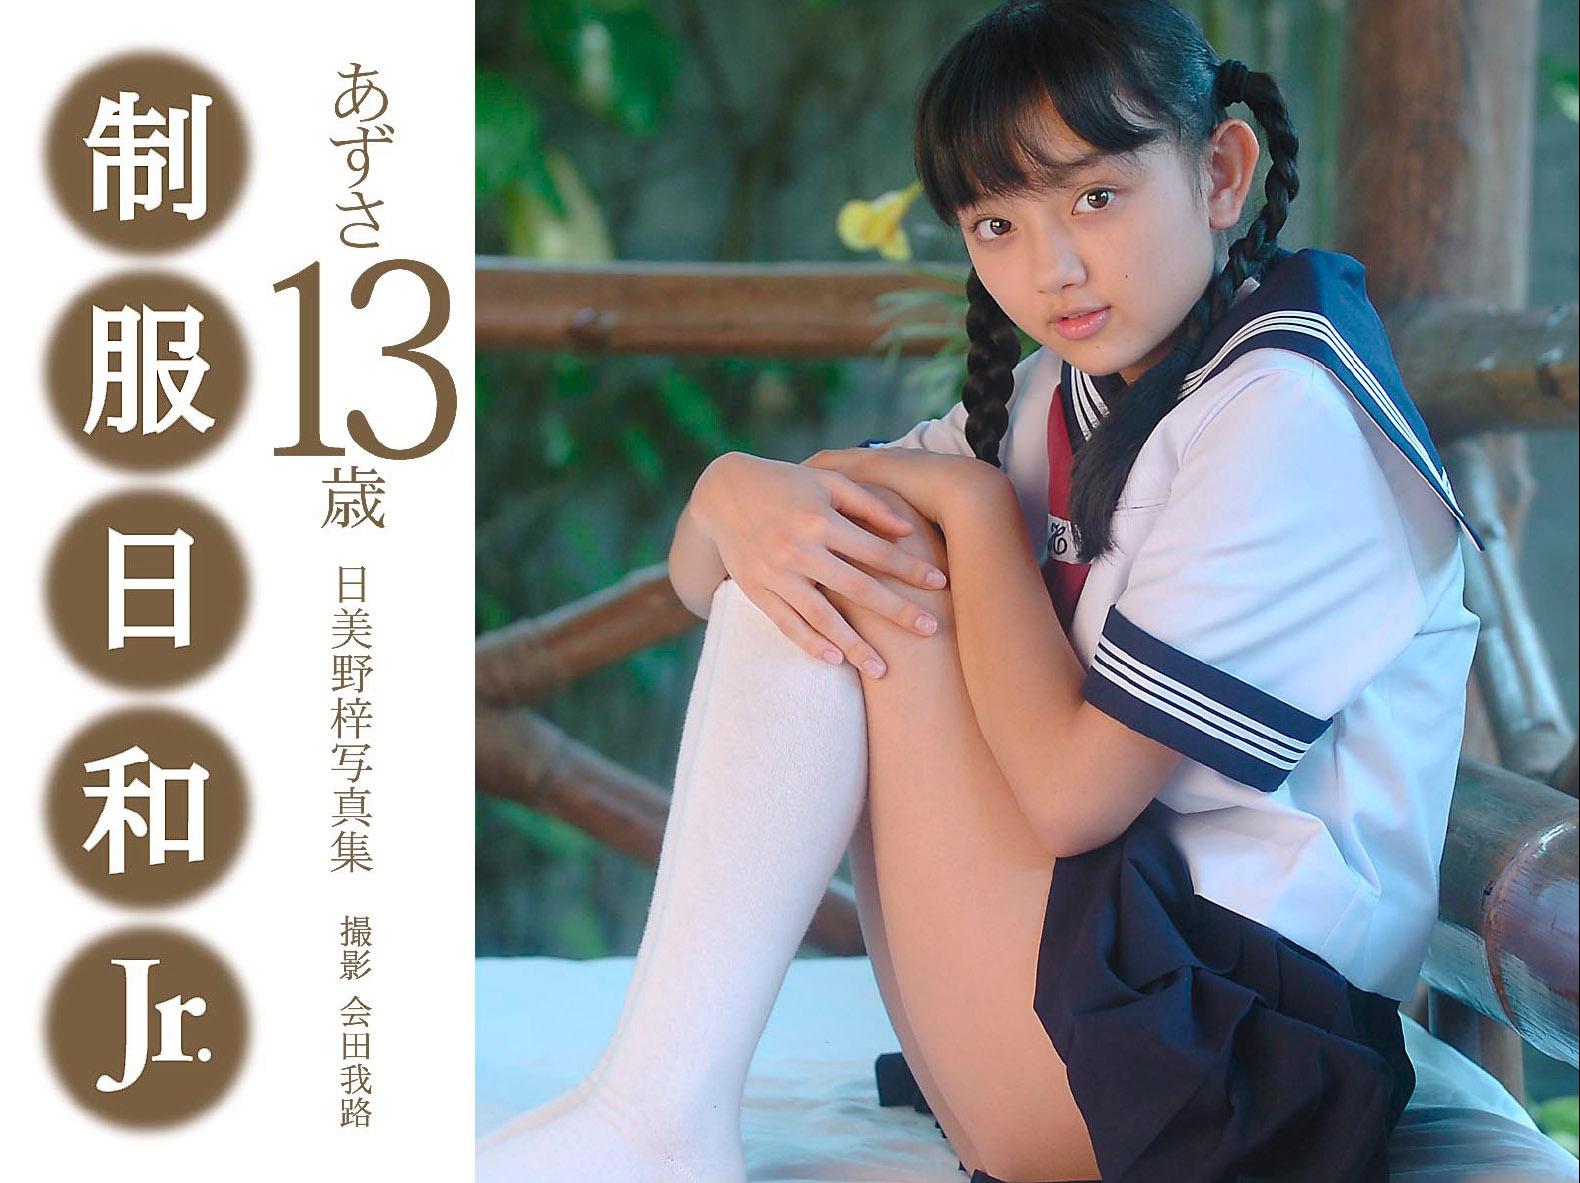 Azusa Hibino (日美野梓) 日美野梓 制服美少女図鑑 あずさ13歳 日比野梓 Azusa Hibino: Japanese Junior High SchoolGirl Free  DVD & Photo Book